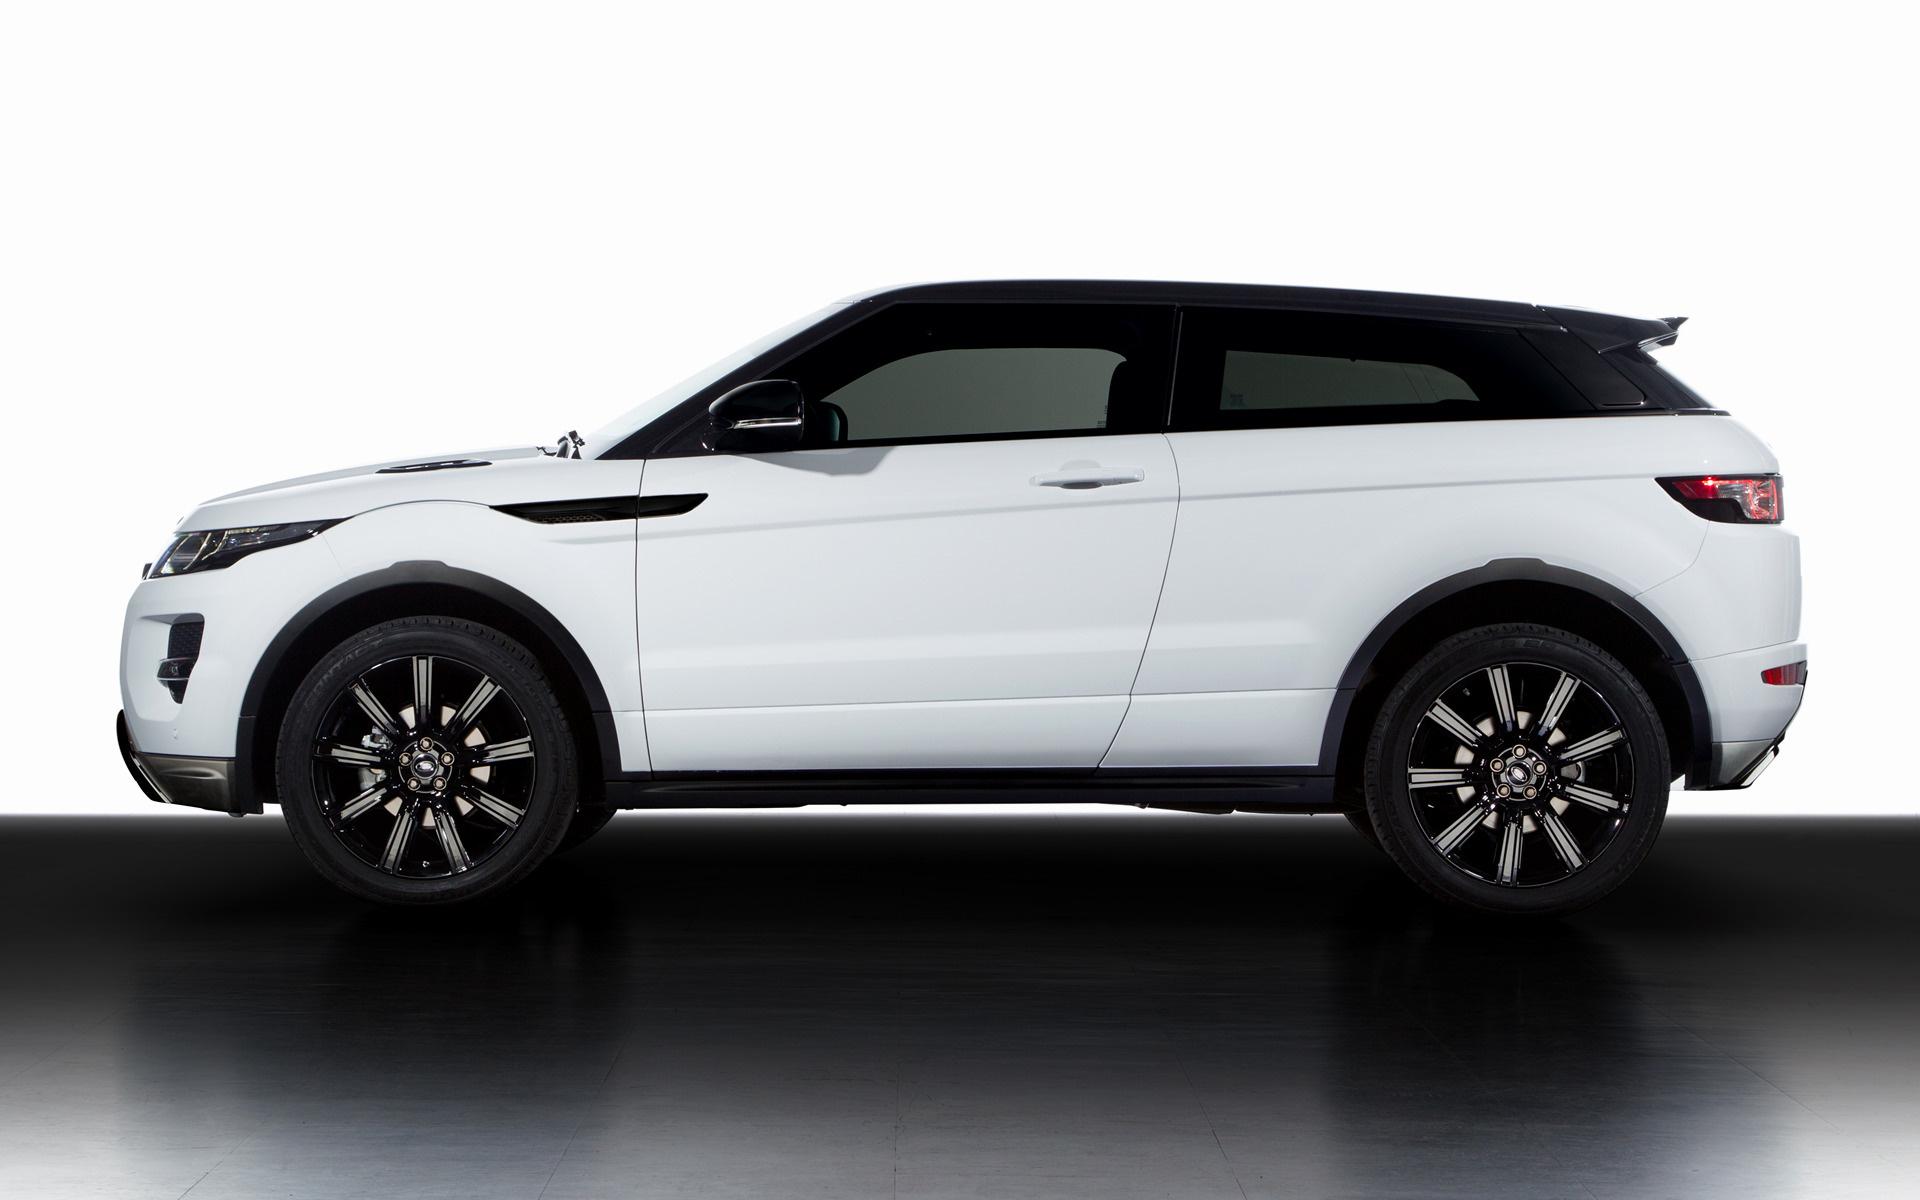 2013 Range Rover Evoque Coupe Dynamic Black Design Pack